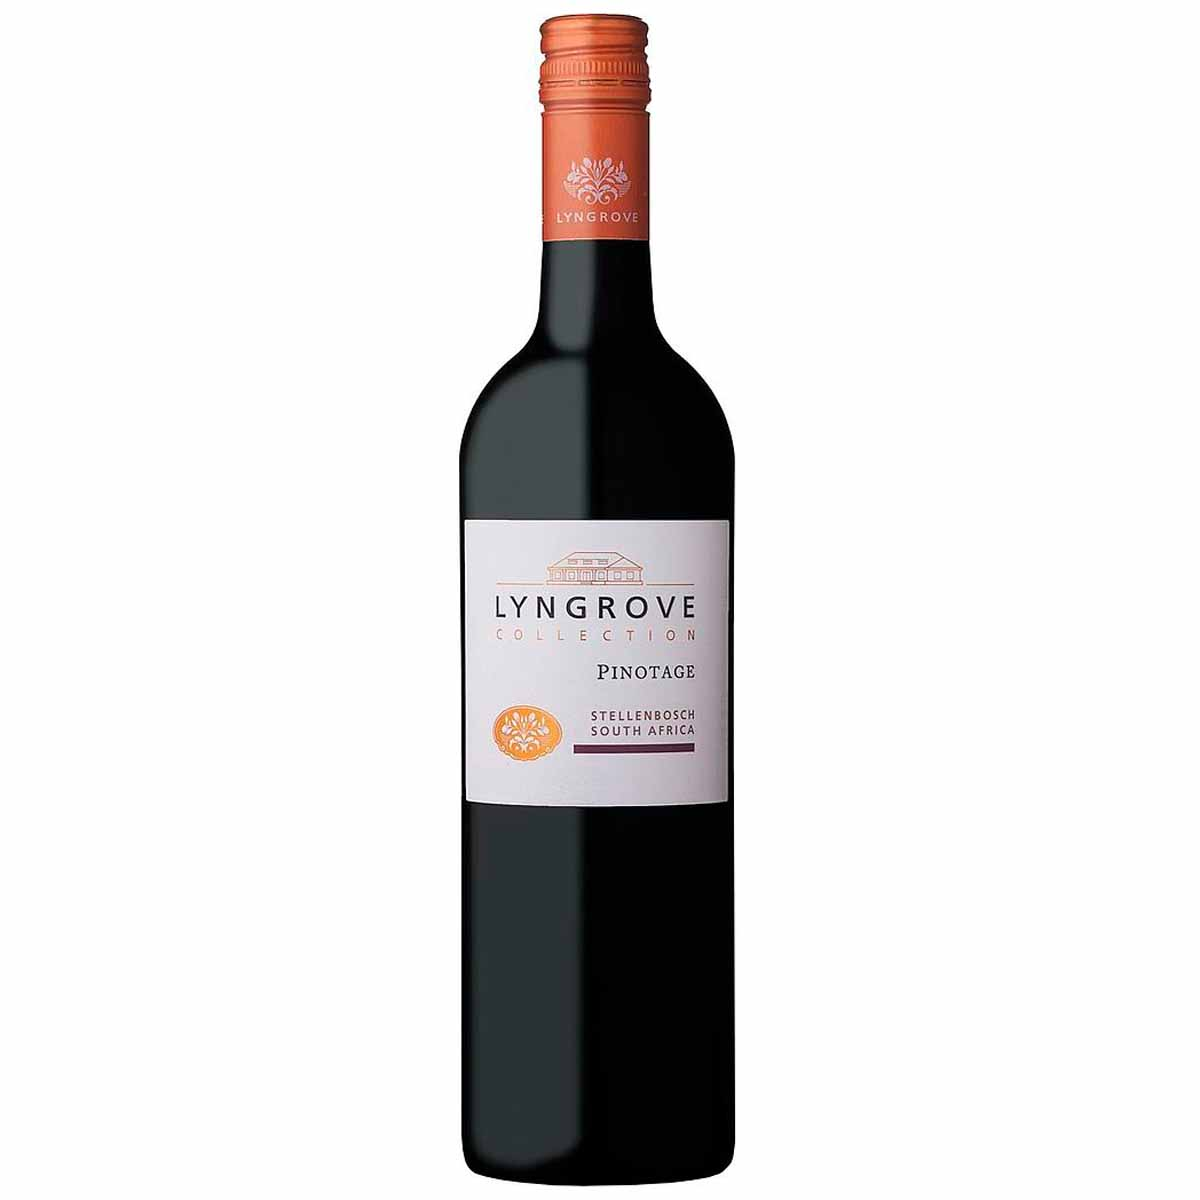 Vinho Tinto Sul-africano Lyngrove Collection Pinotage 2018